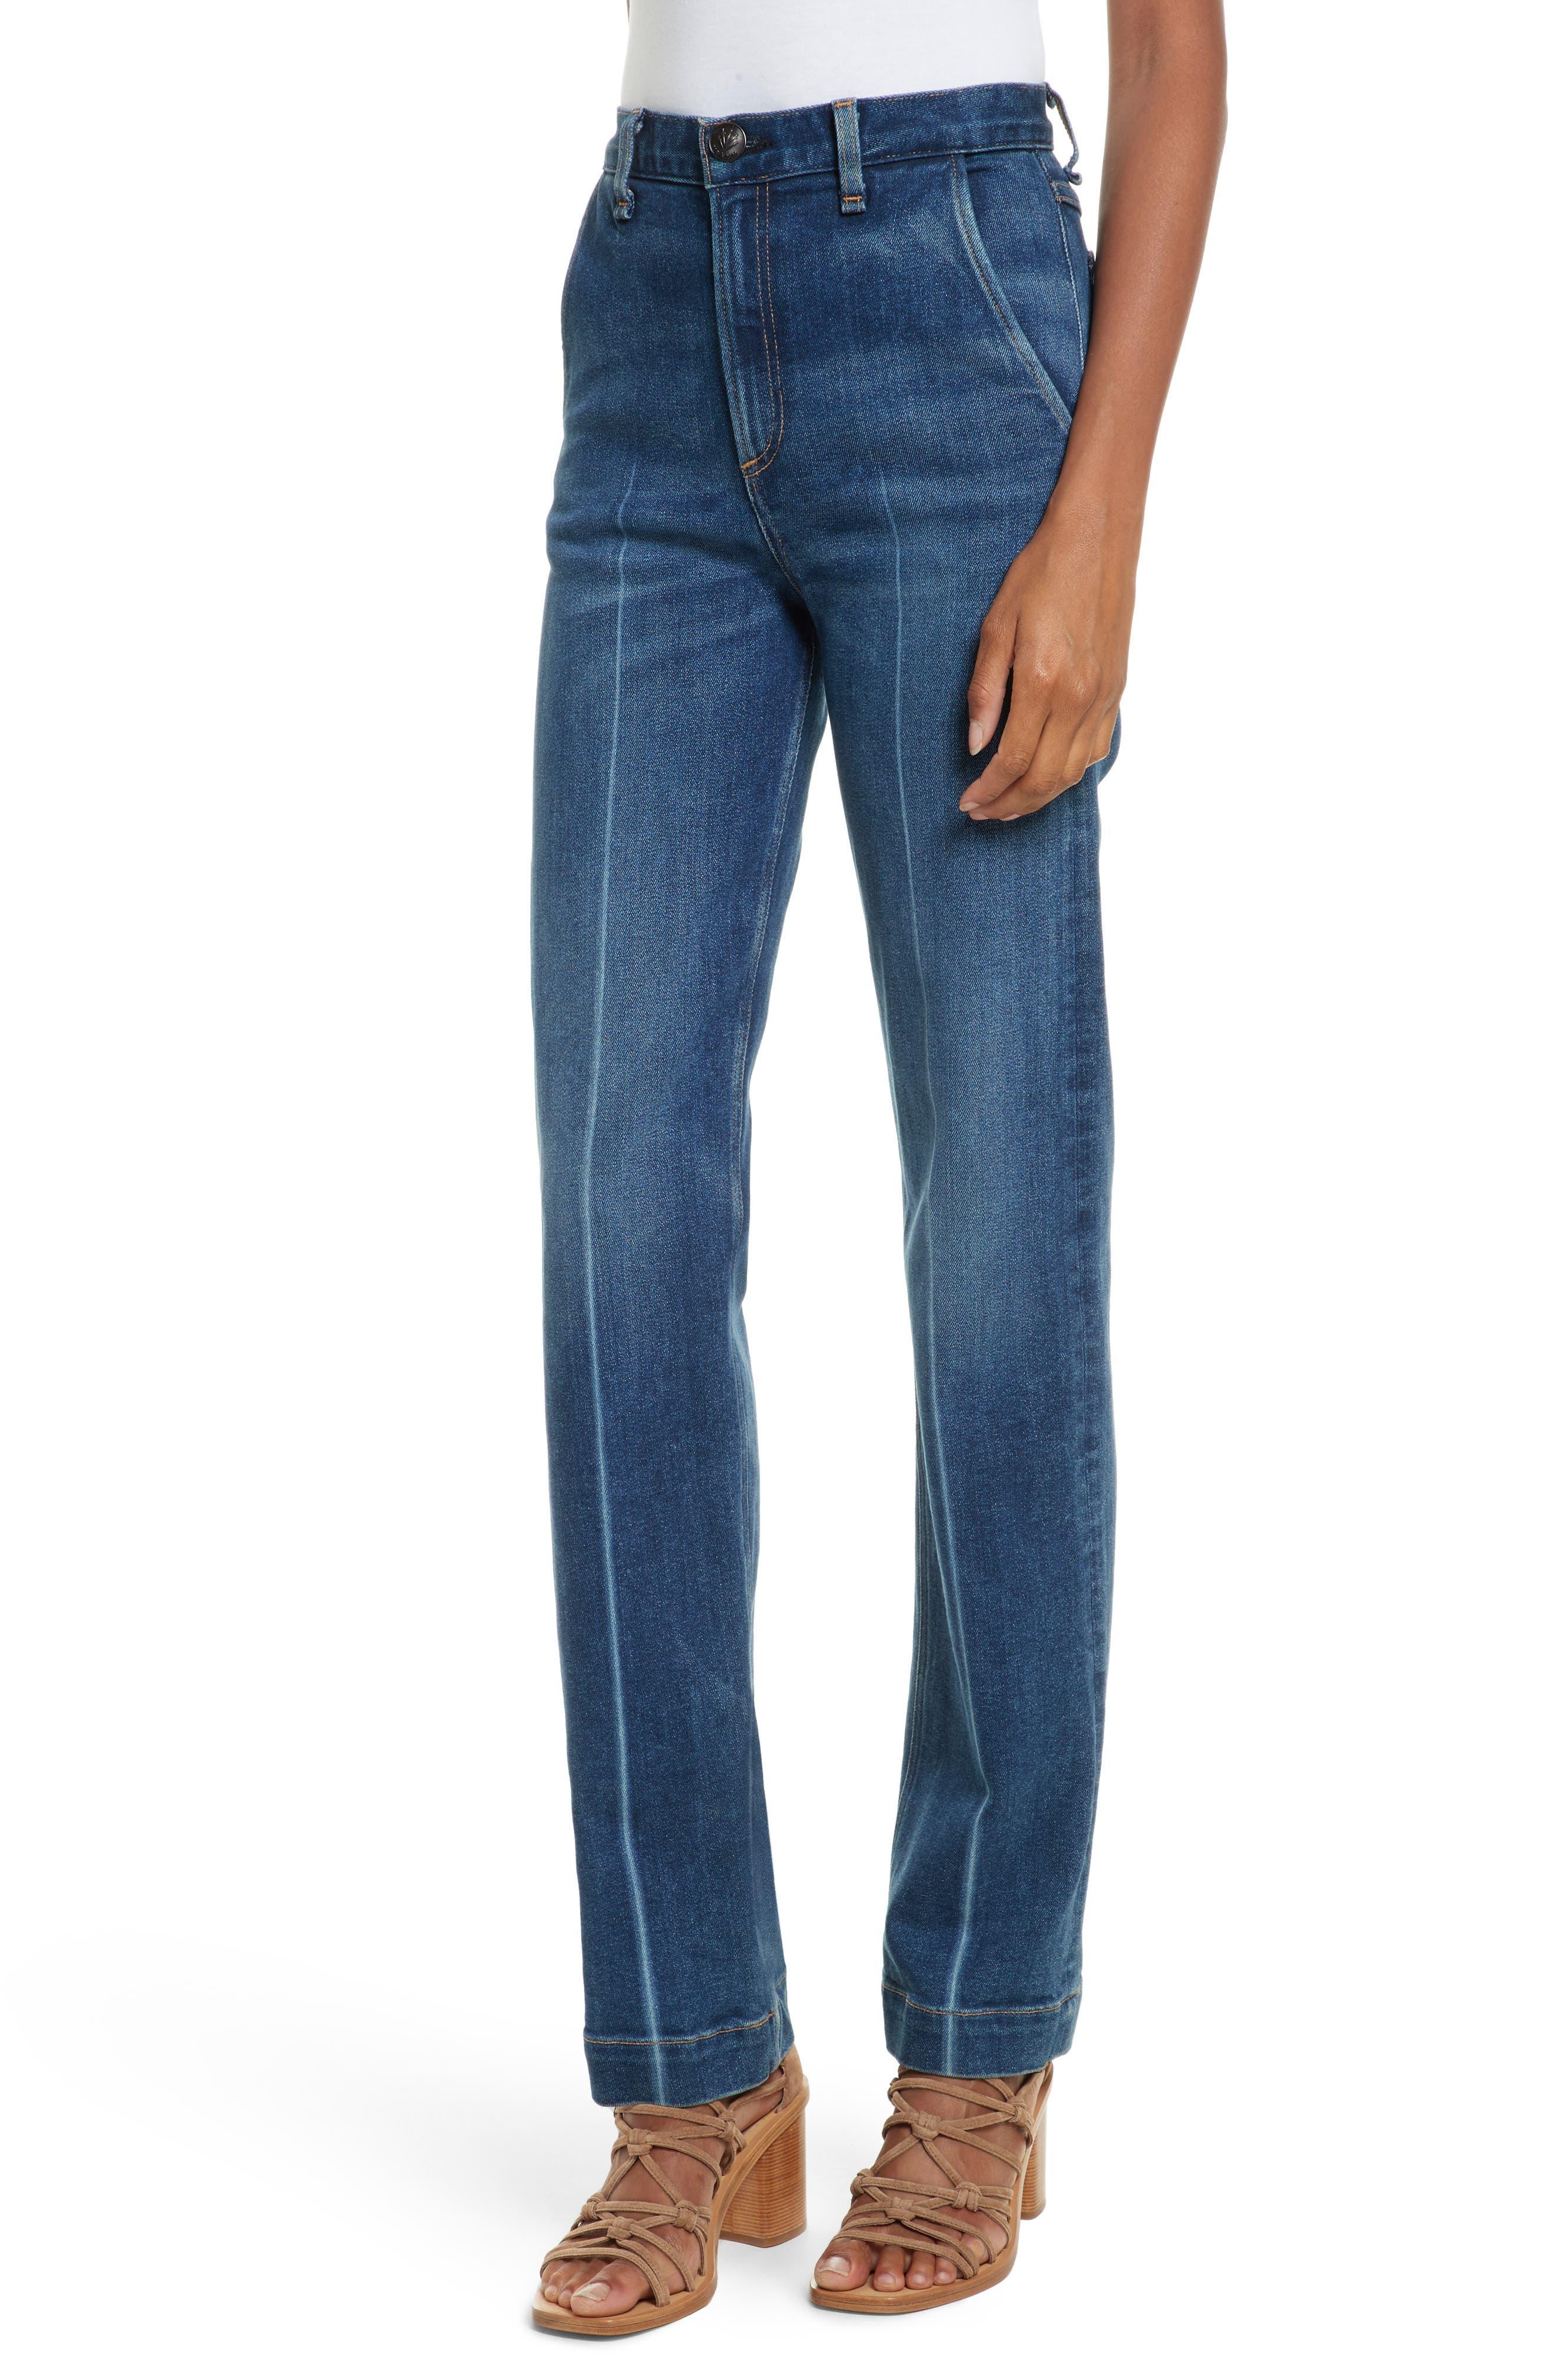 Justine High Waist Trouser Jeans,                             Main thumbnail 1, color,                             462